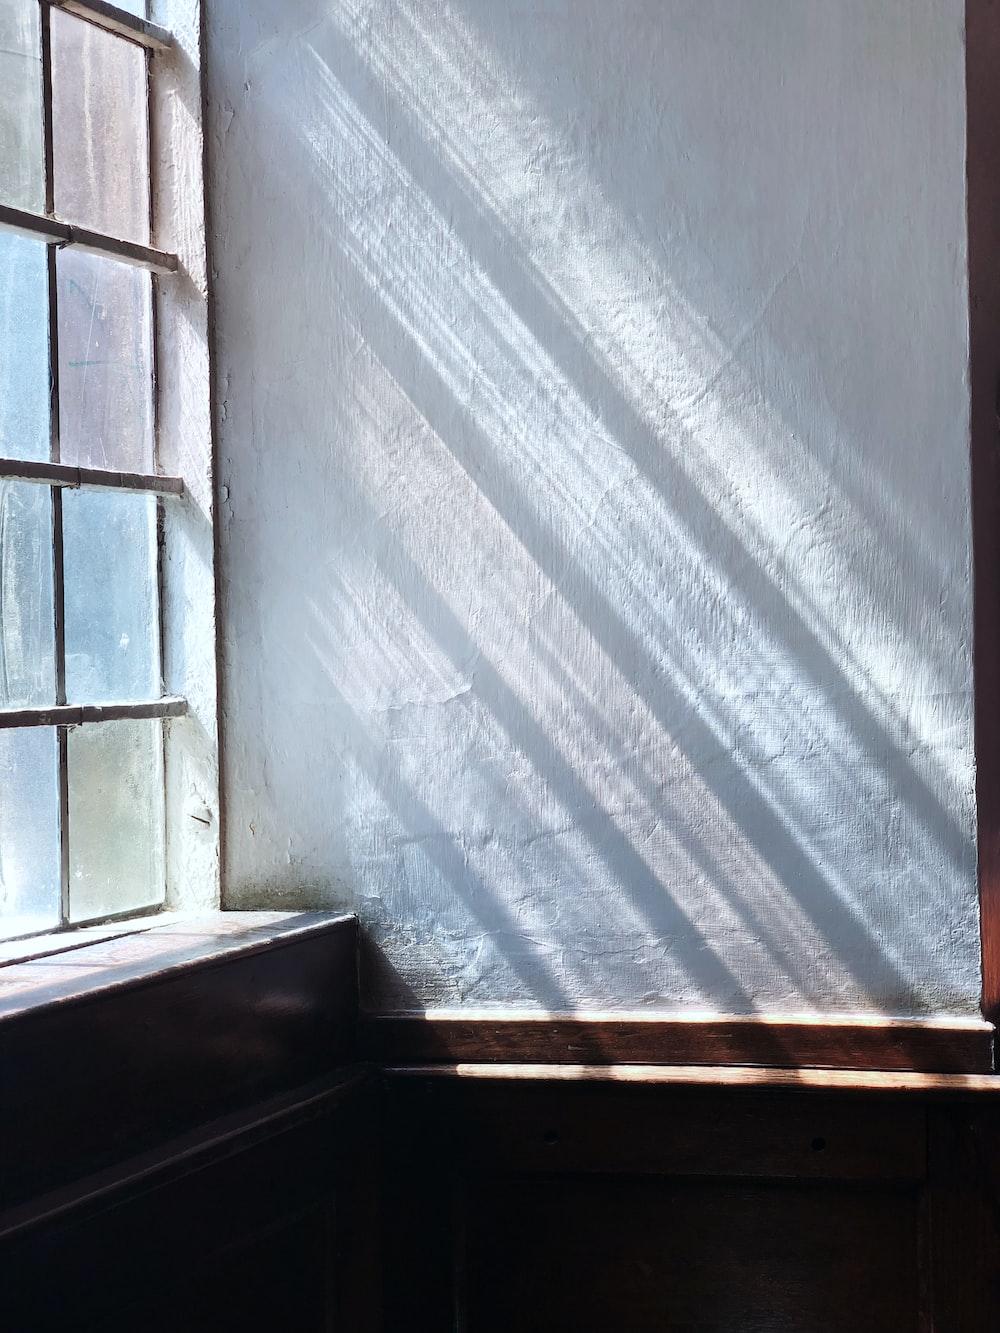 sunrays streaming through window